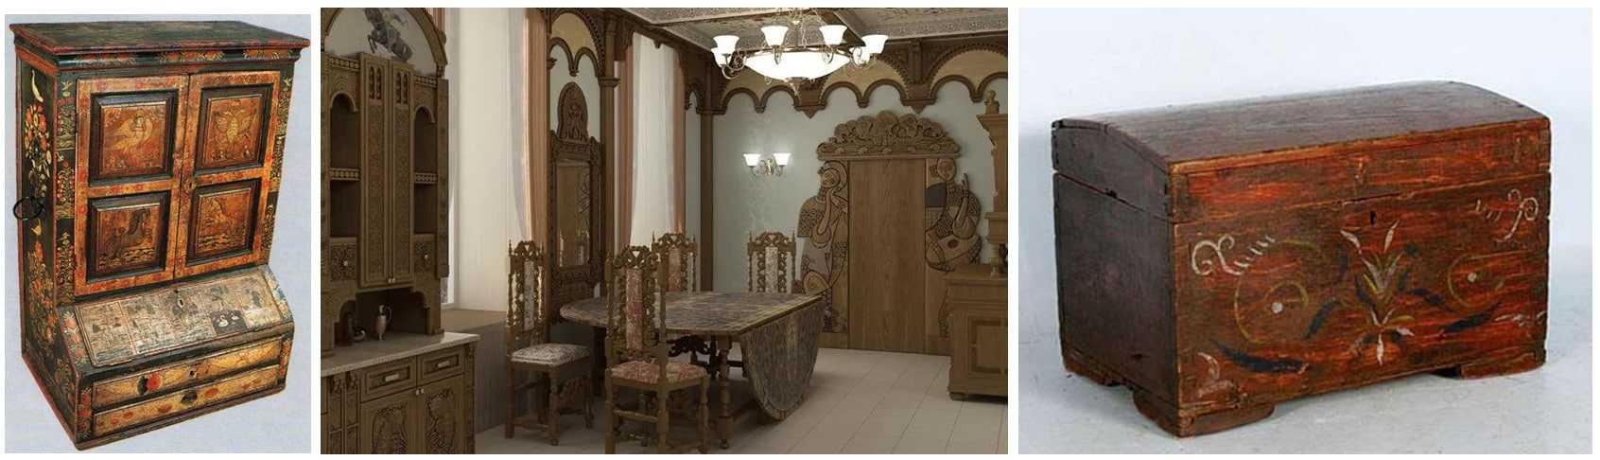 интерьер стиле Древней Руси